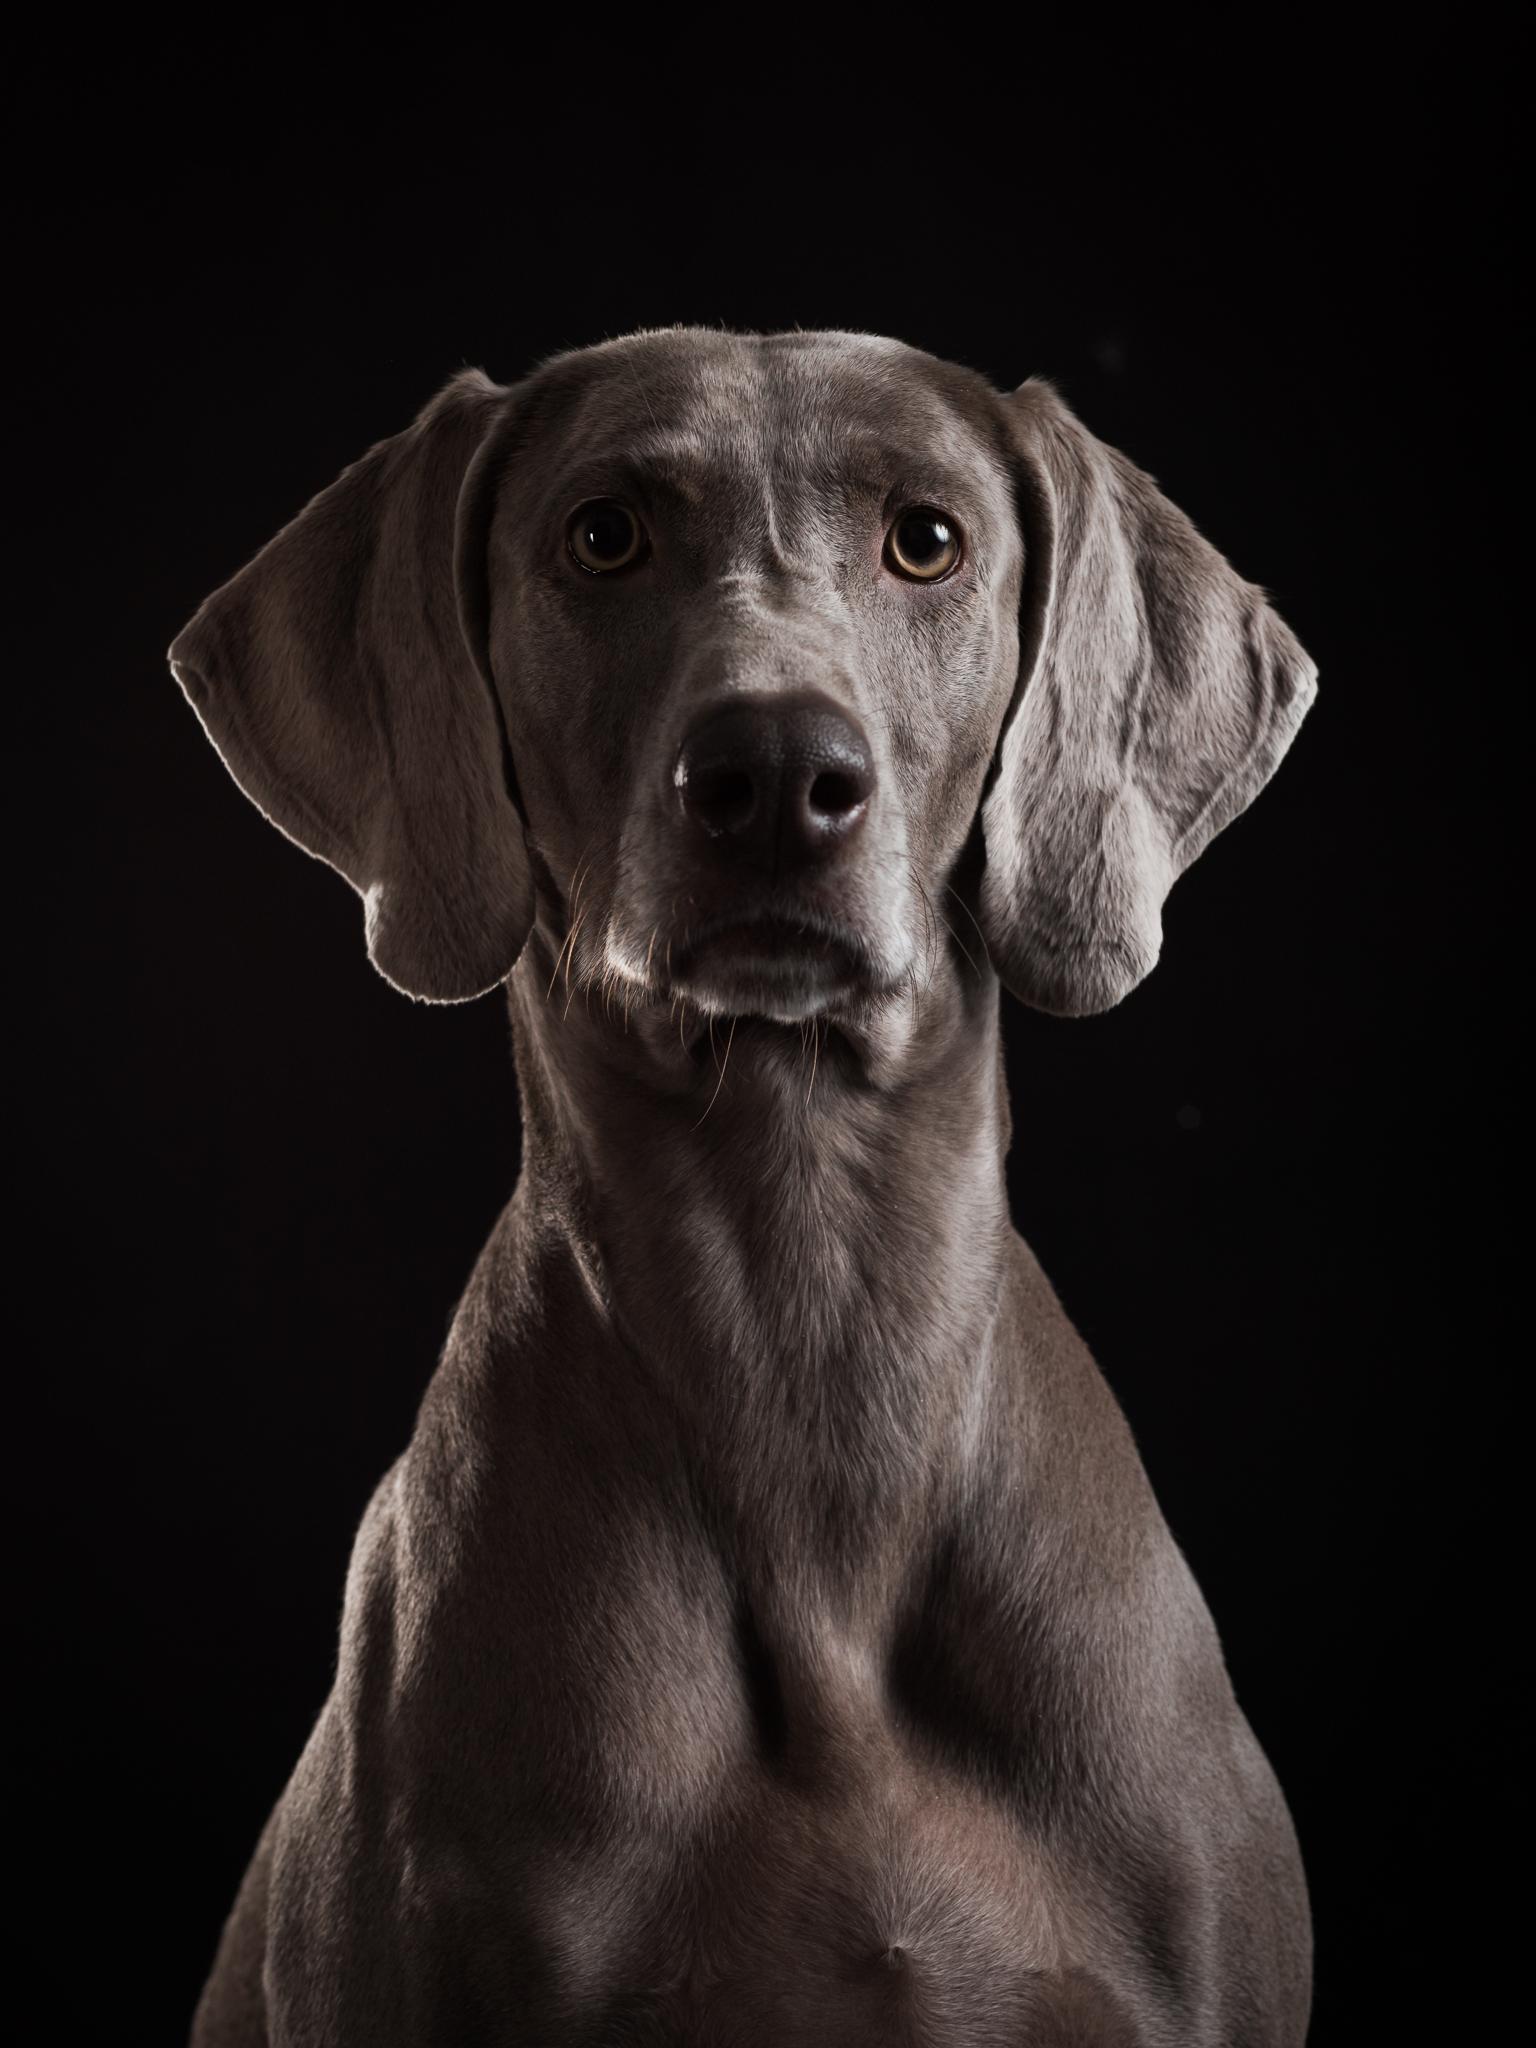 klaus-dyba-dog-photography-weimaraner